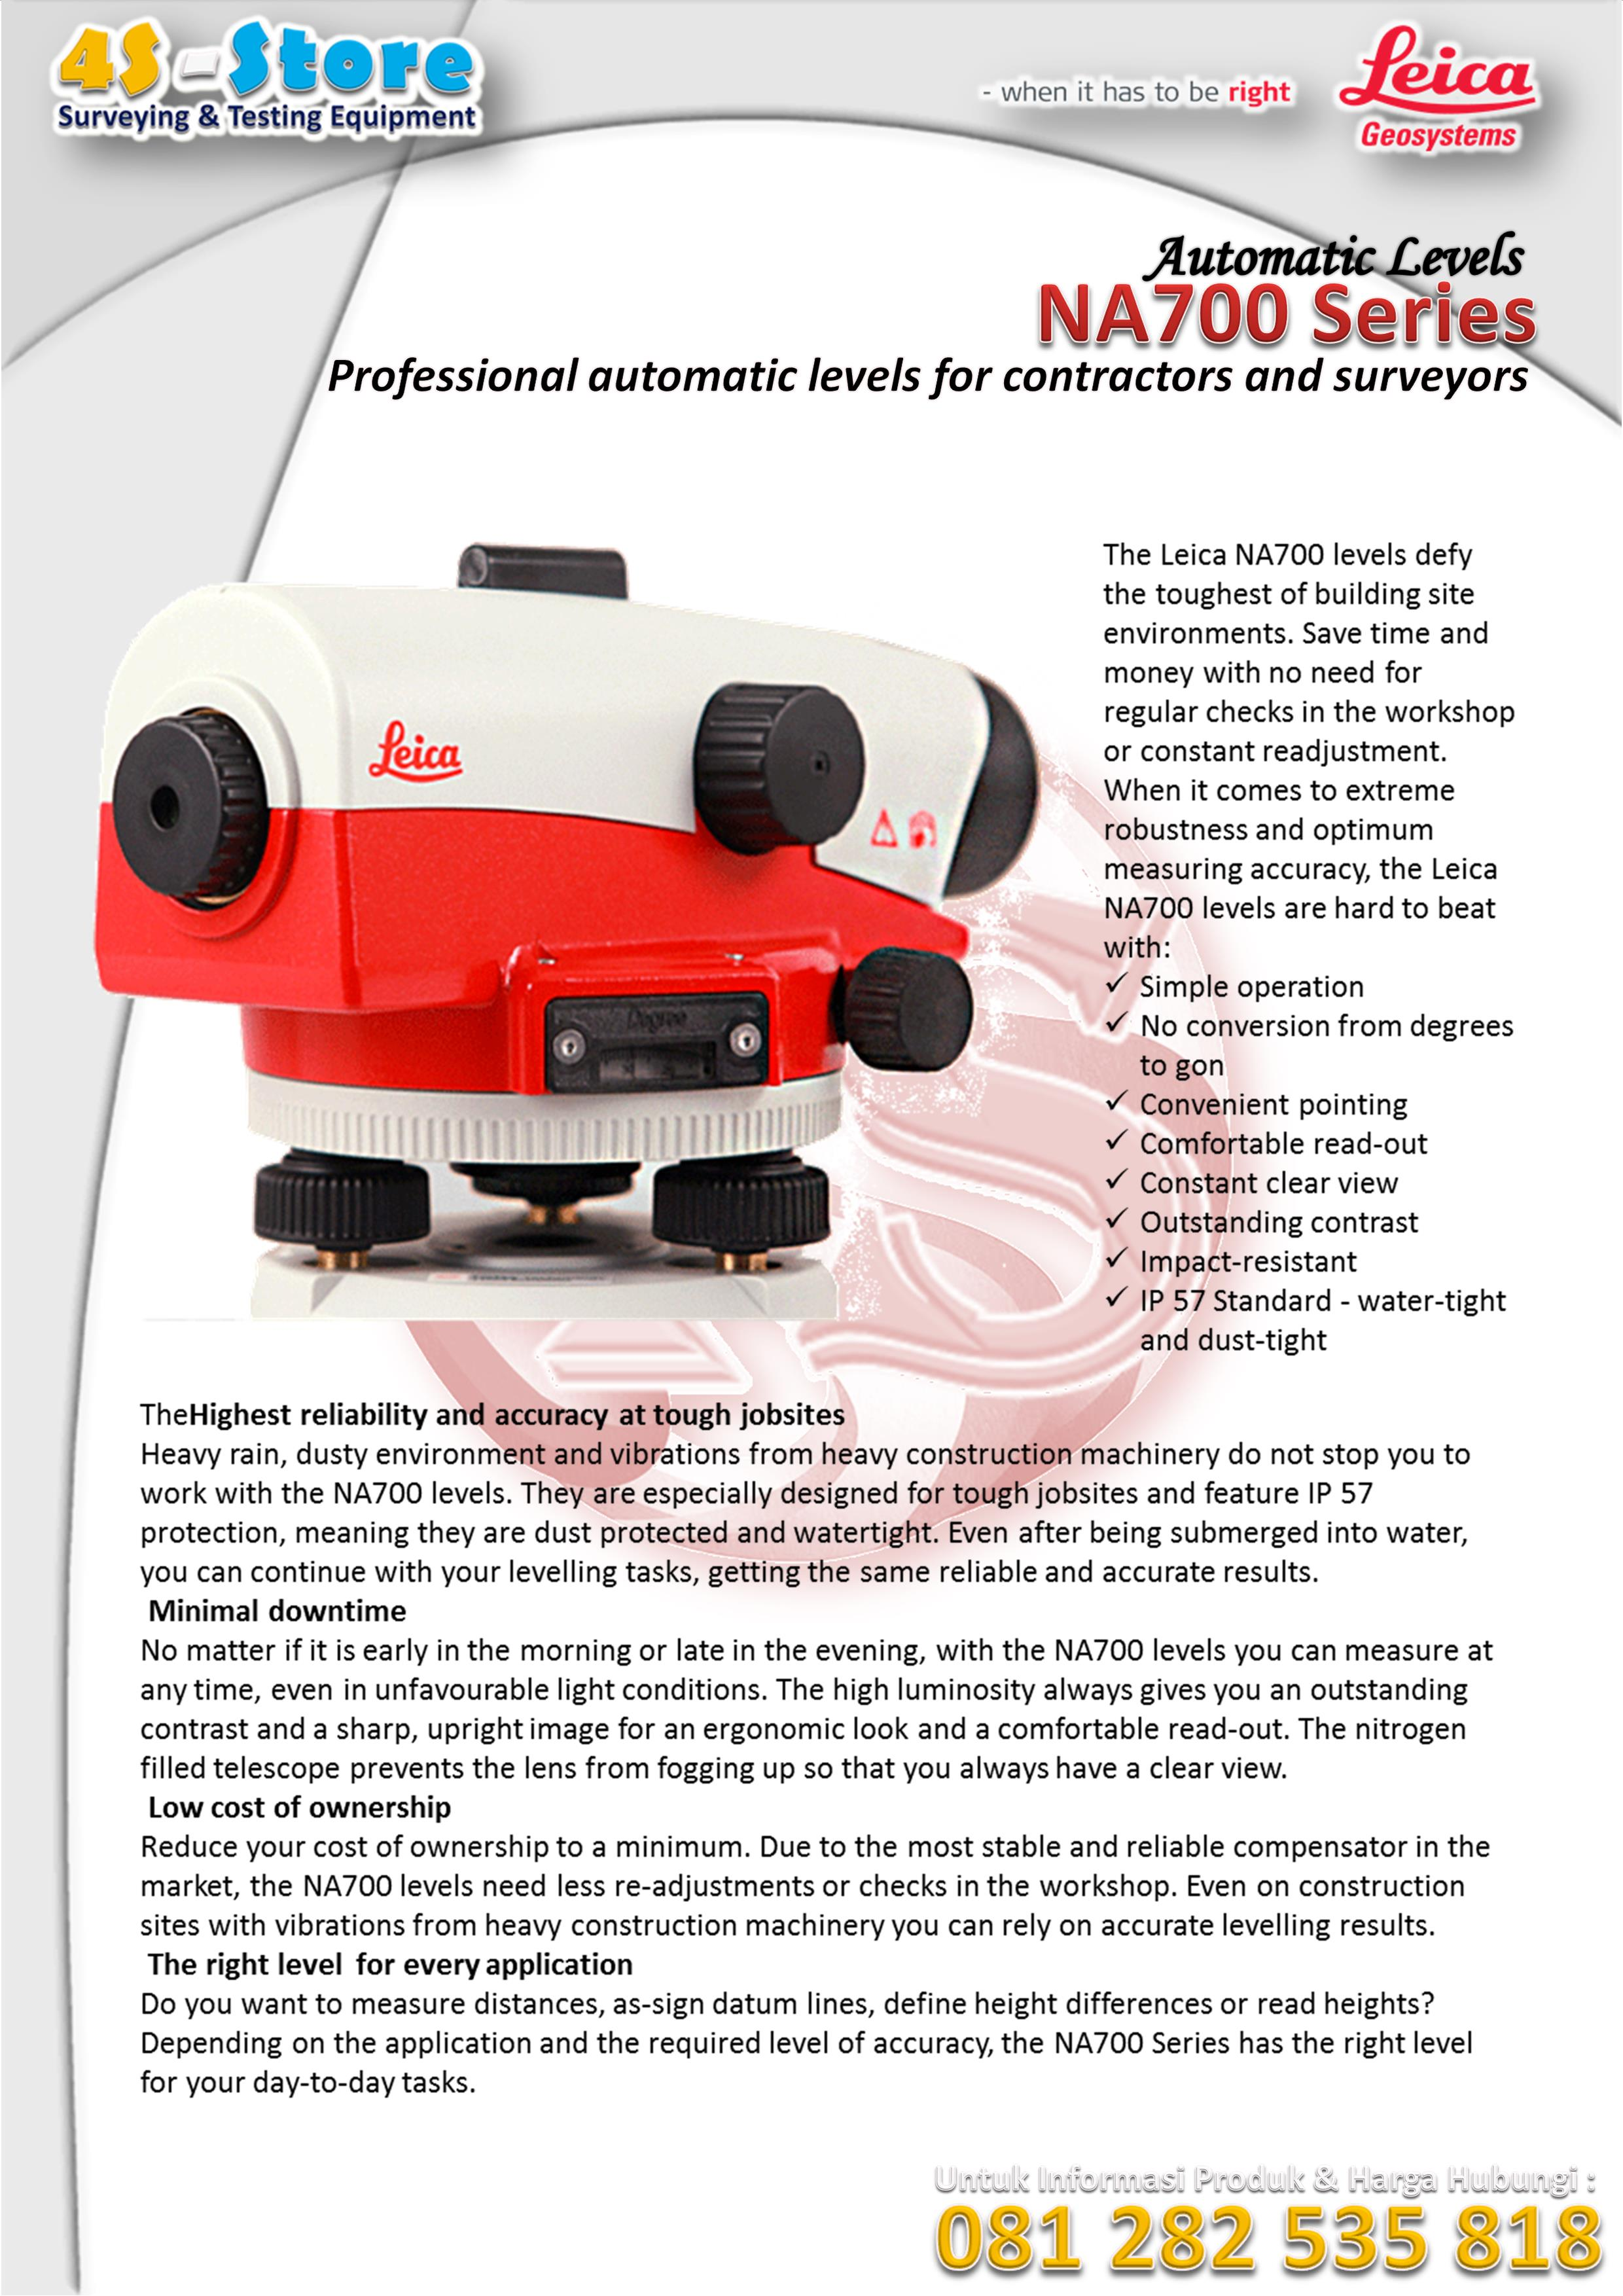 leica geosystem  u2013 all produk  u2013 4s store surveying